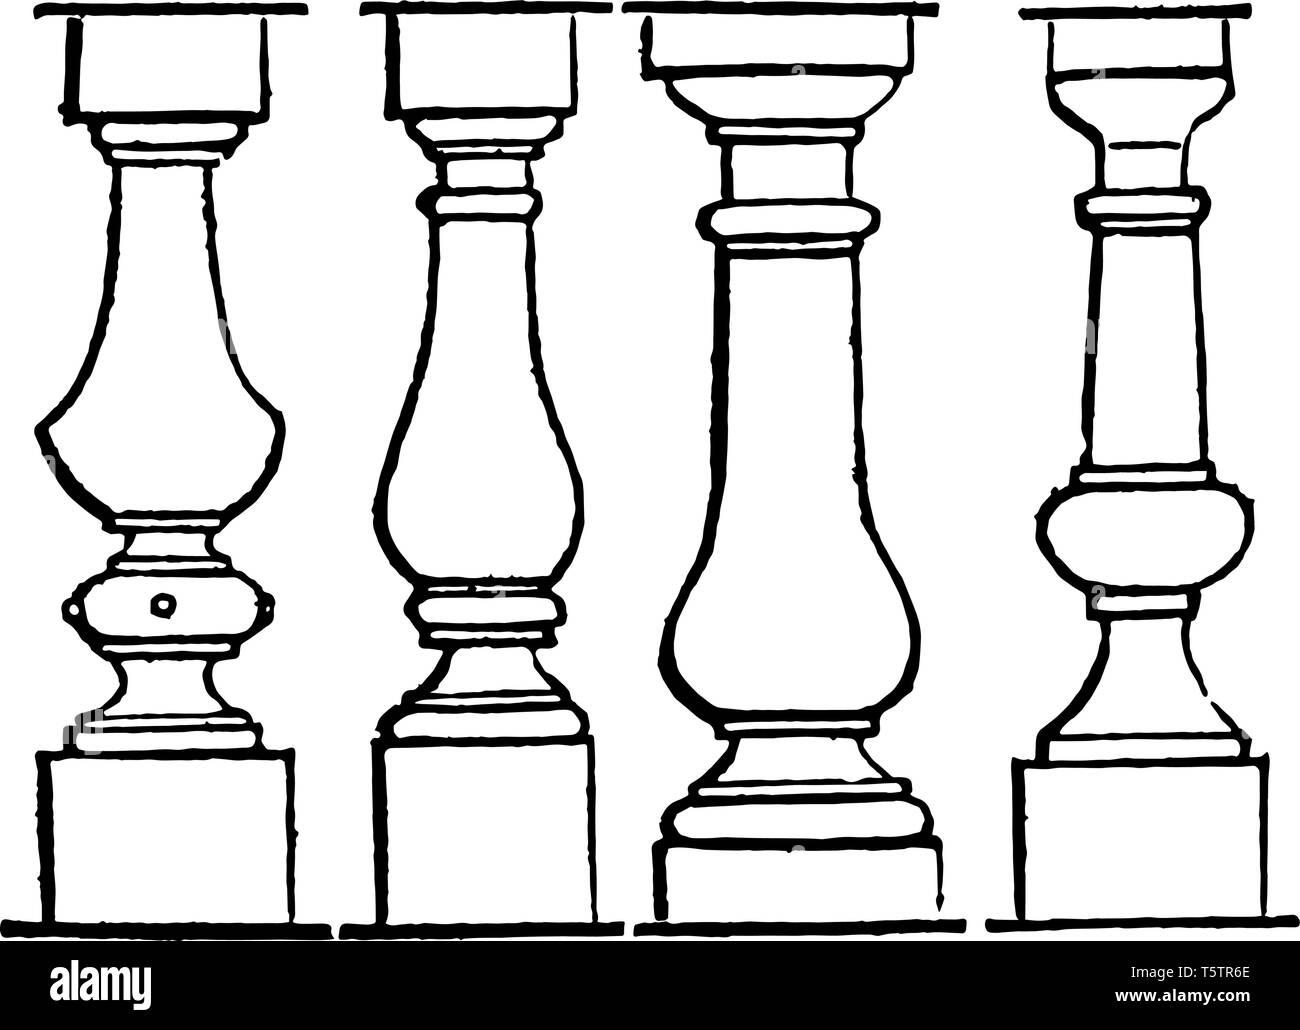 Baluster line short equal distances cornice coping swelling vintage line drawing or engraving illustration. - Stock Image